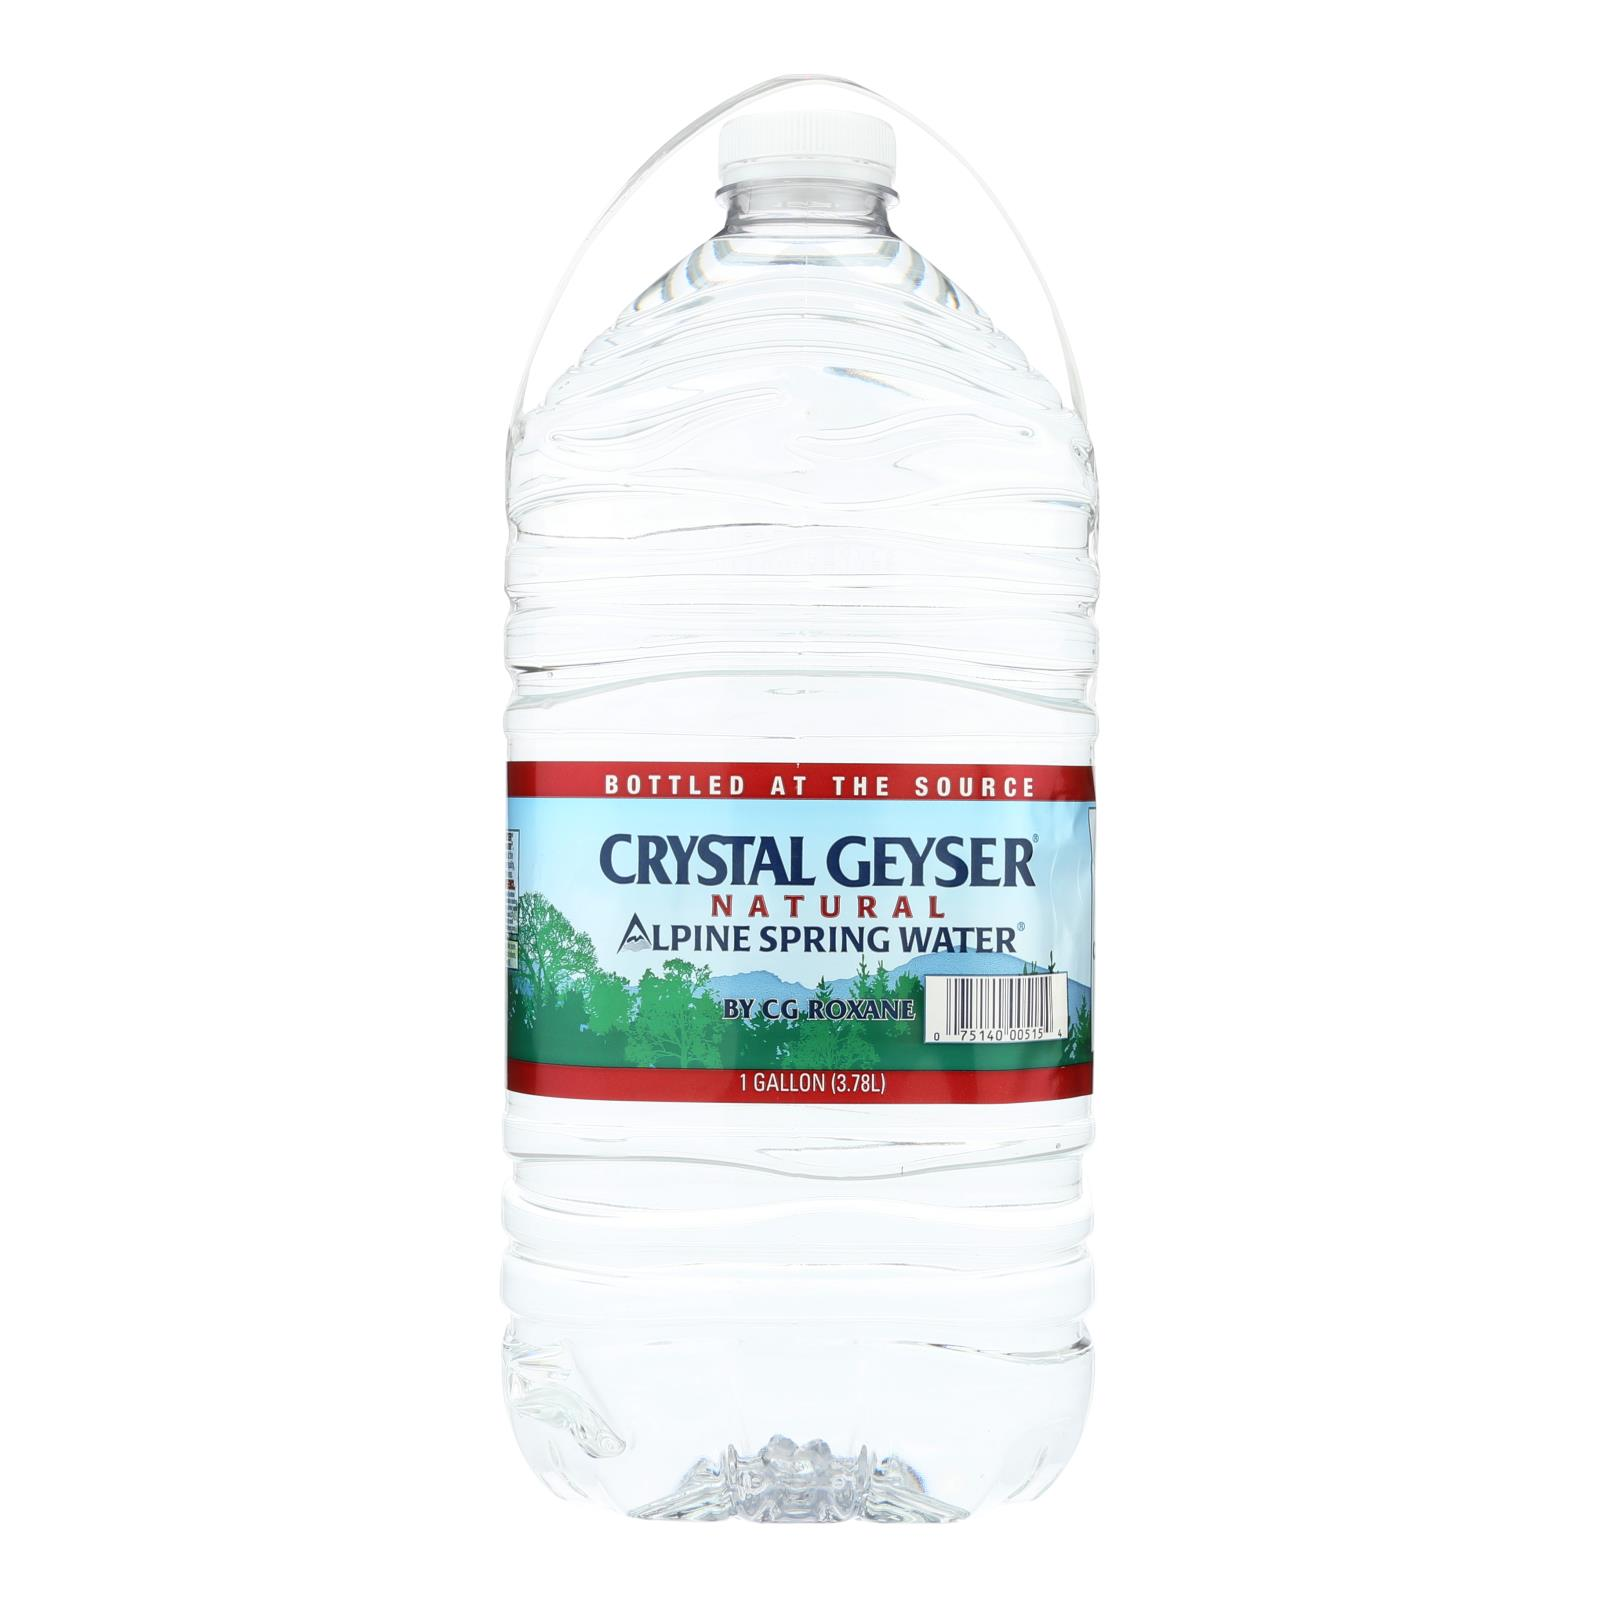 Crystal Geyser Alpine Spring Water - Case of 6 - 1 Gal